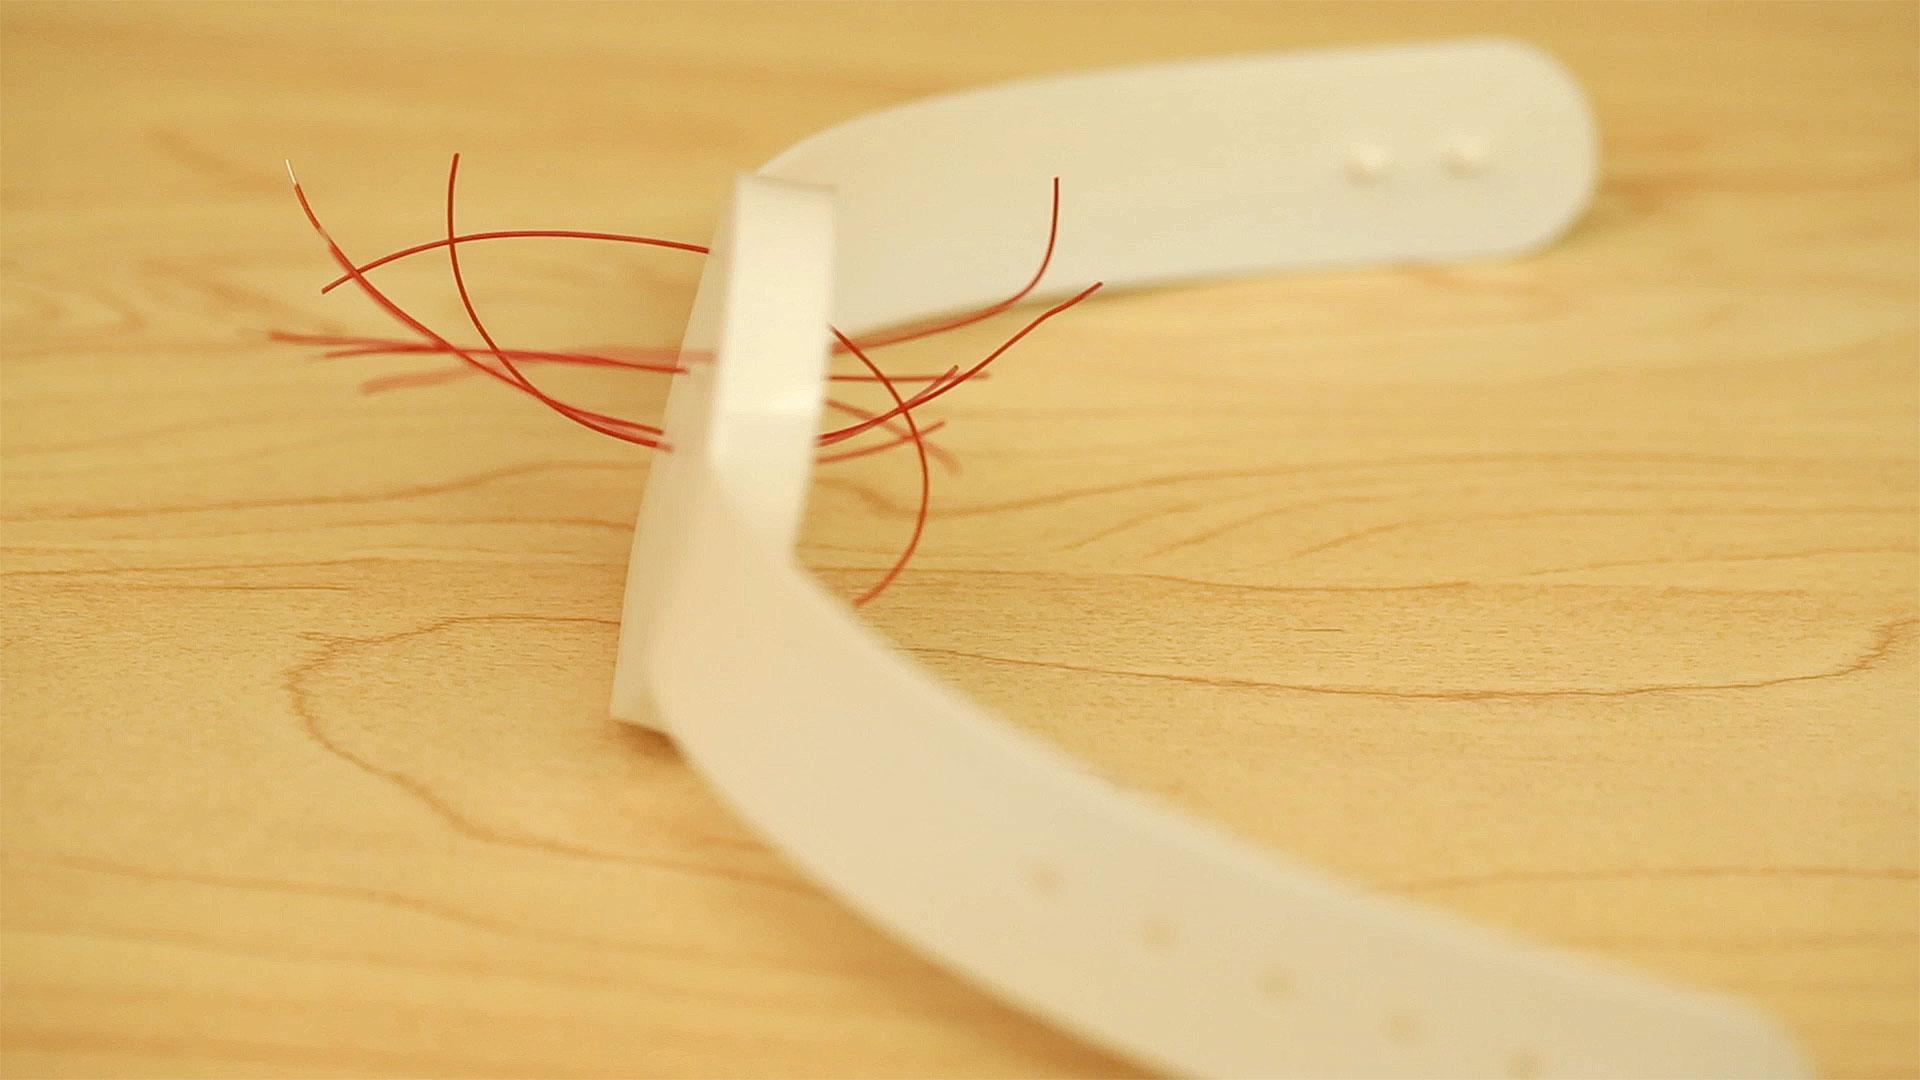 3d_printing_threaded-wires.jpg